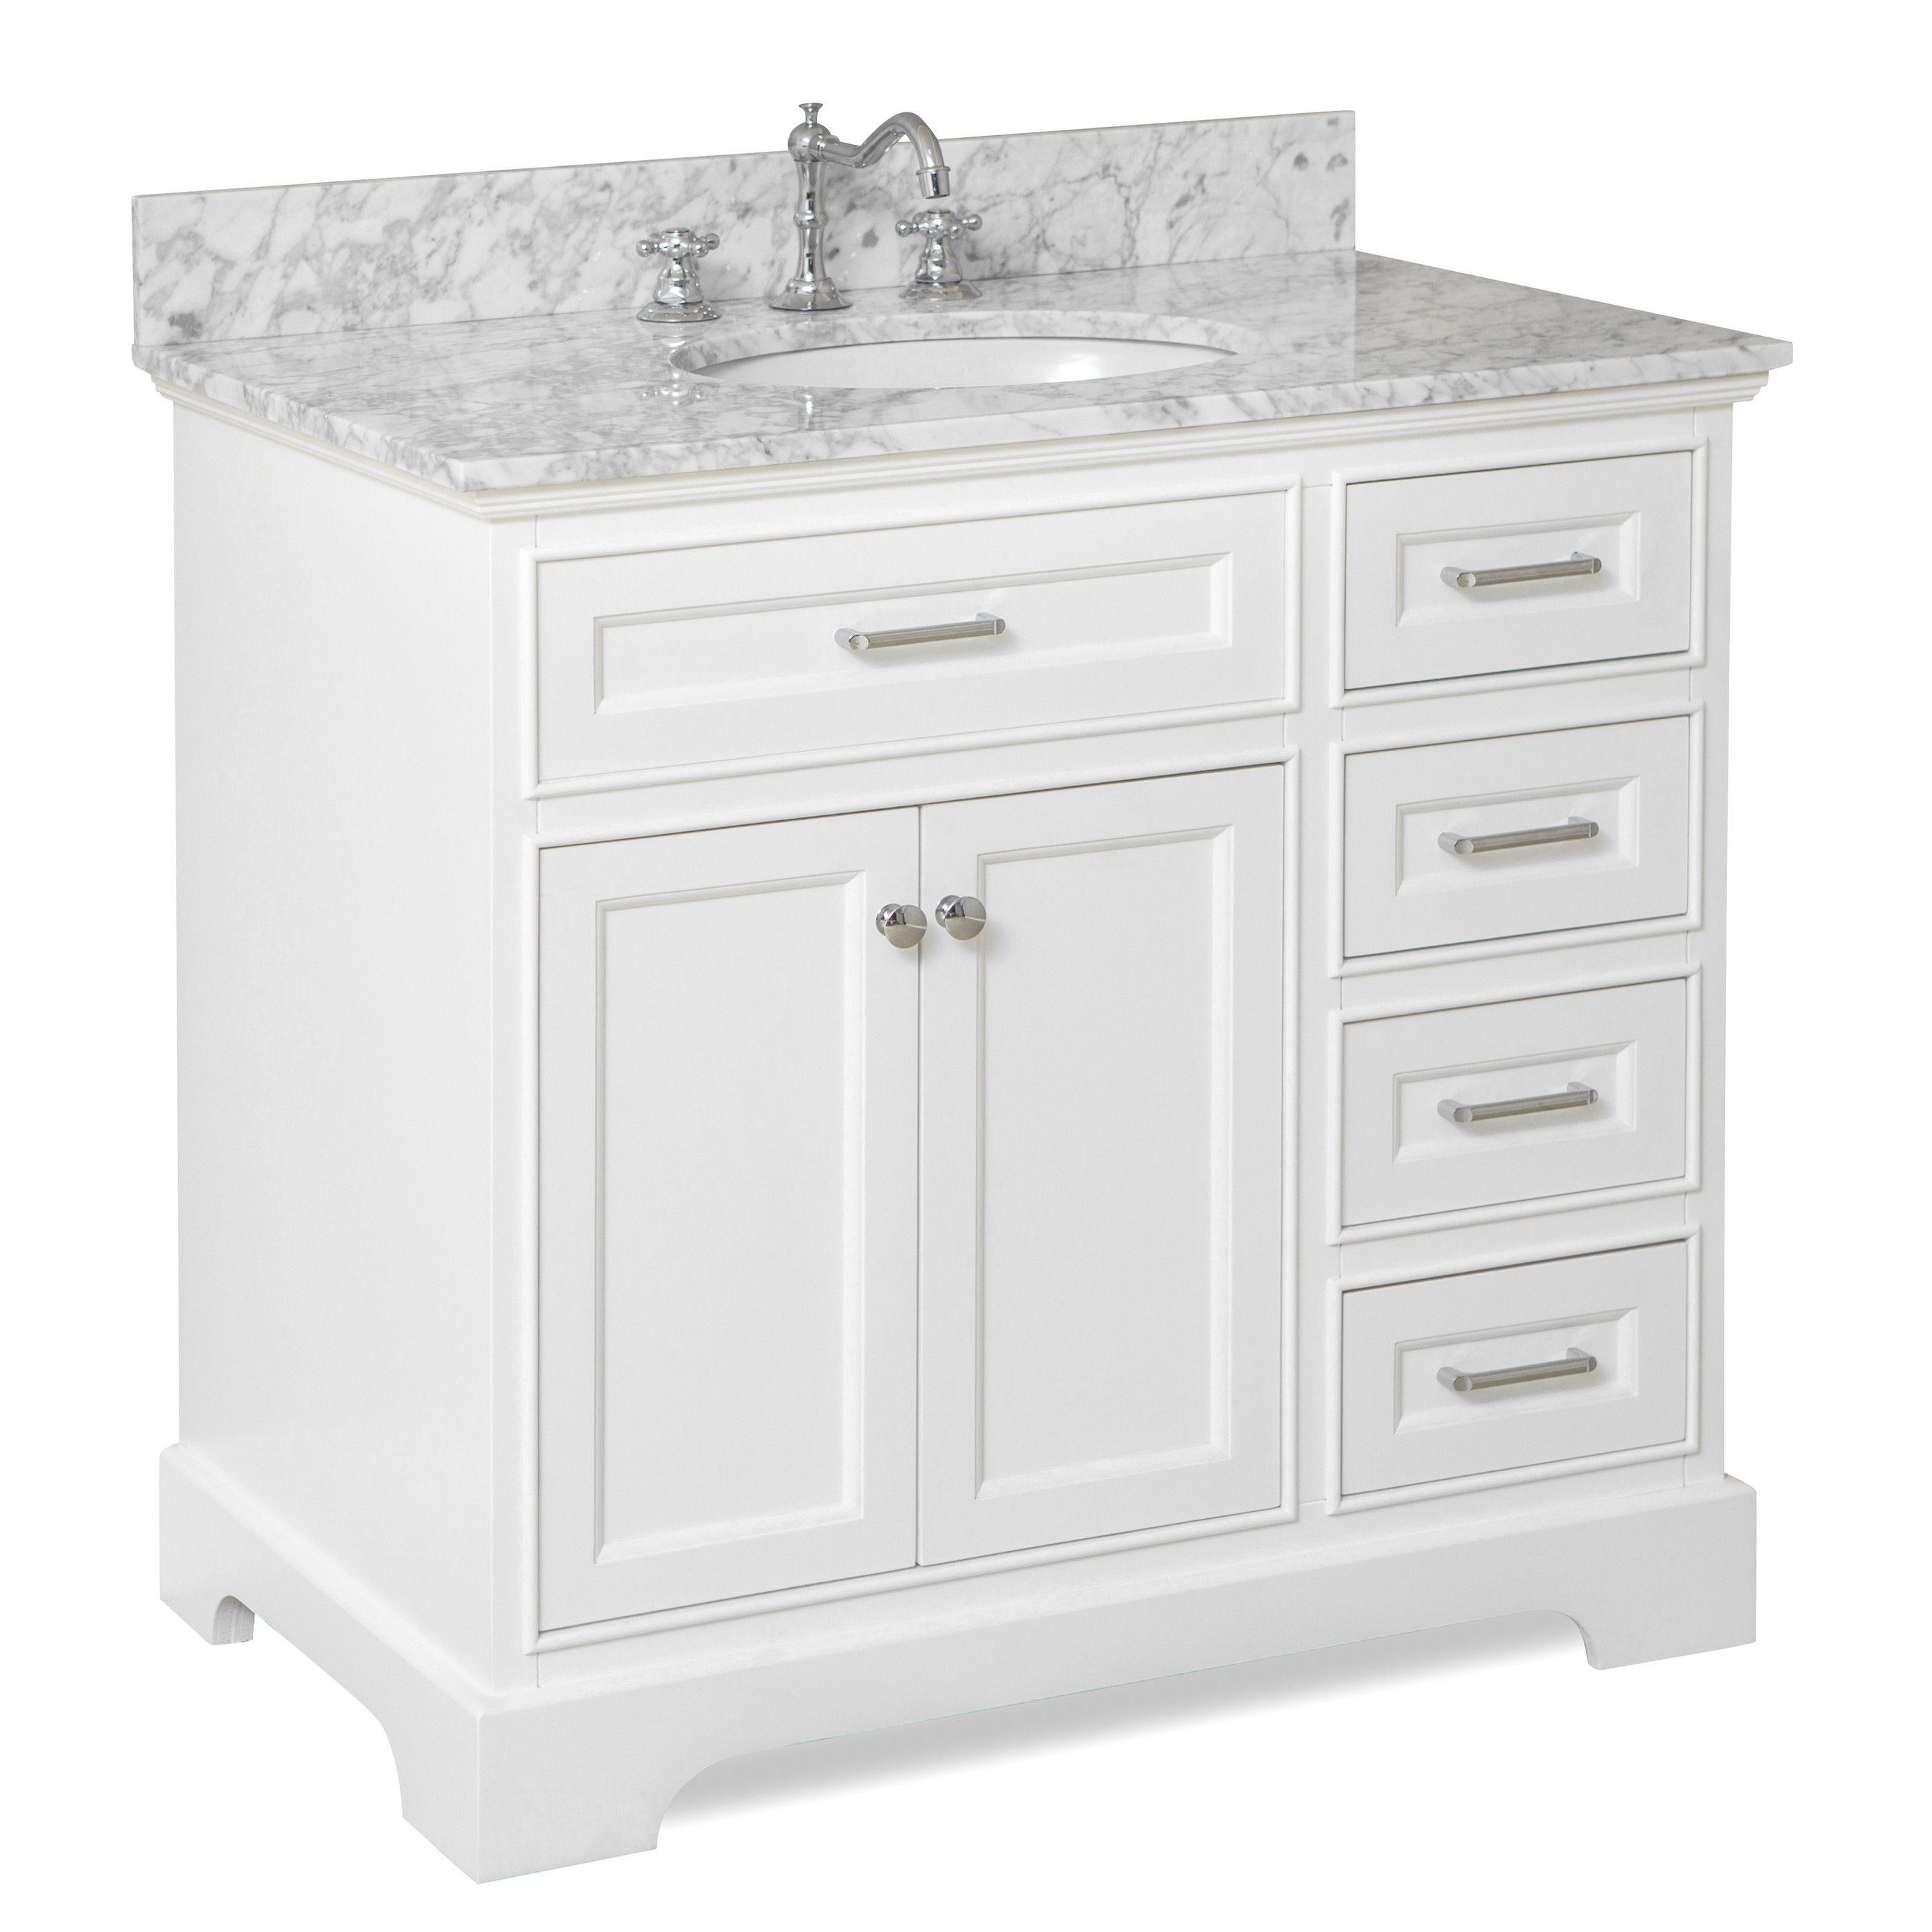 Aria single bathroom vanity set white vanityvanity set36